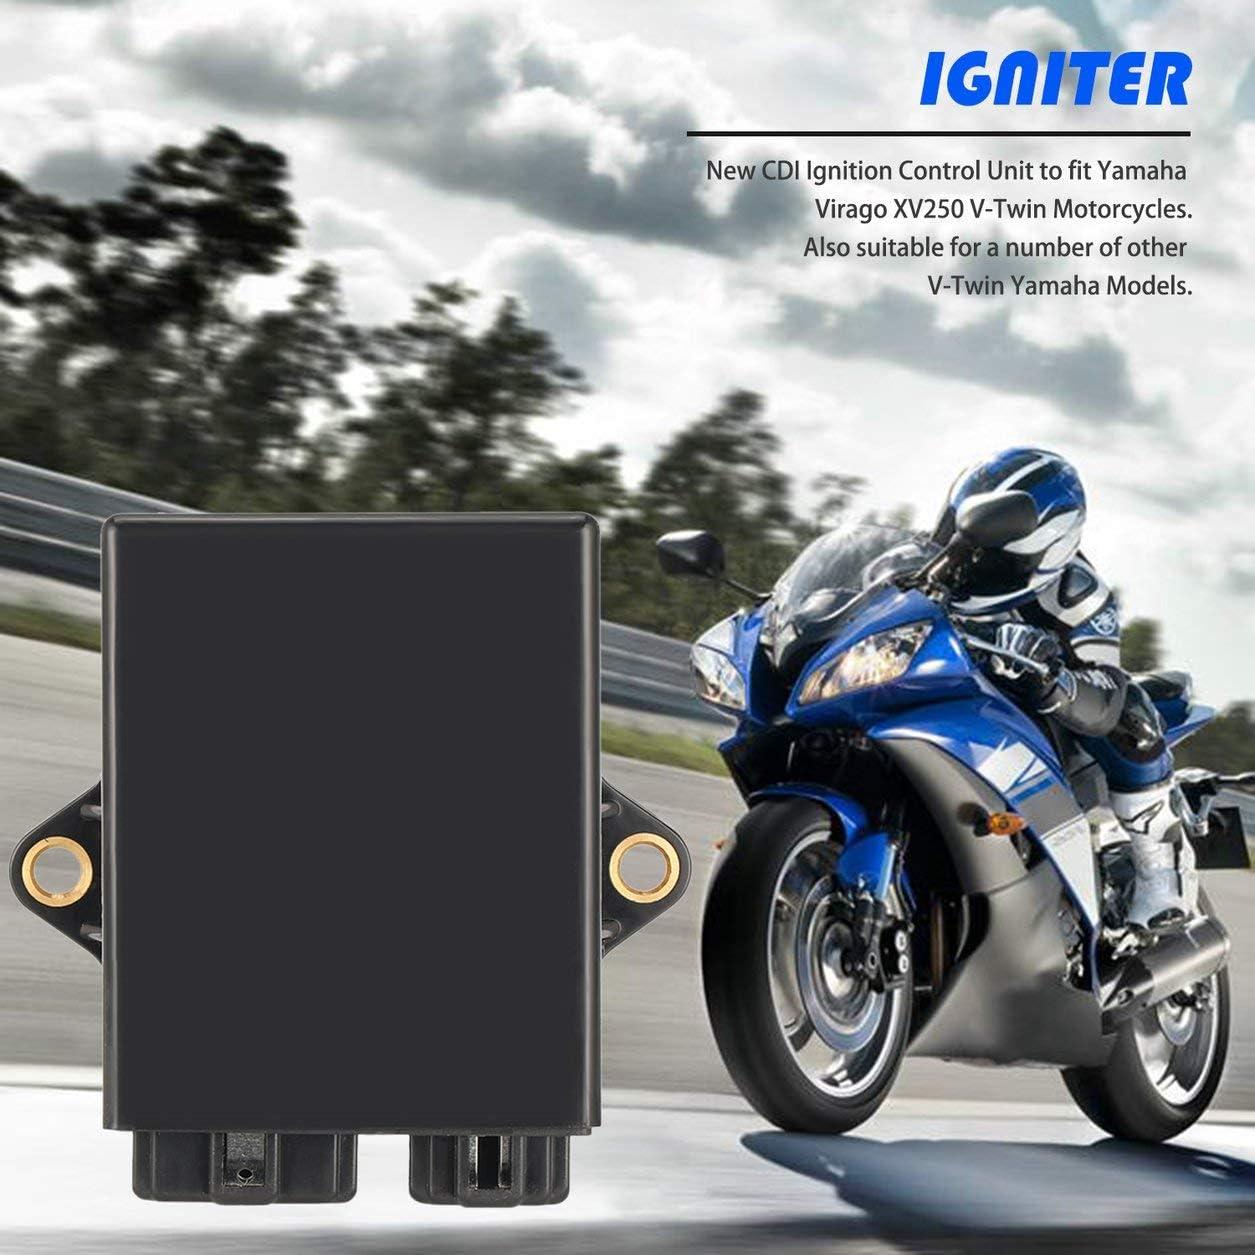 Couleur: Noir calculateur V-Star 250cc Dailyinshop Unit/é CDI pour Yamaha Virago XV250